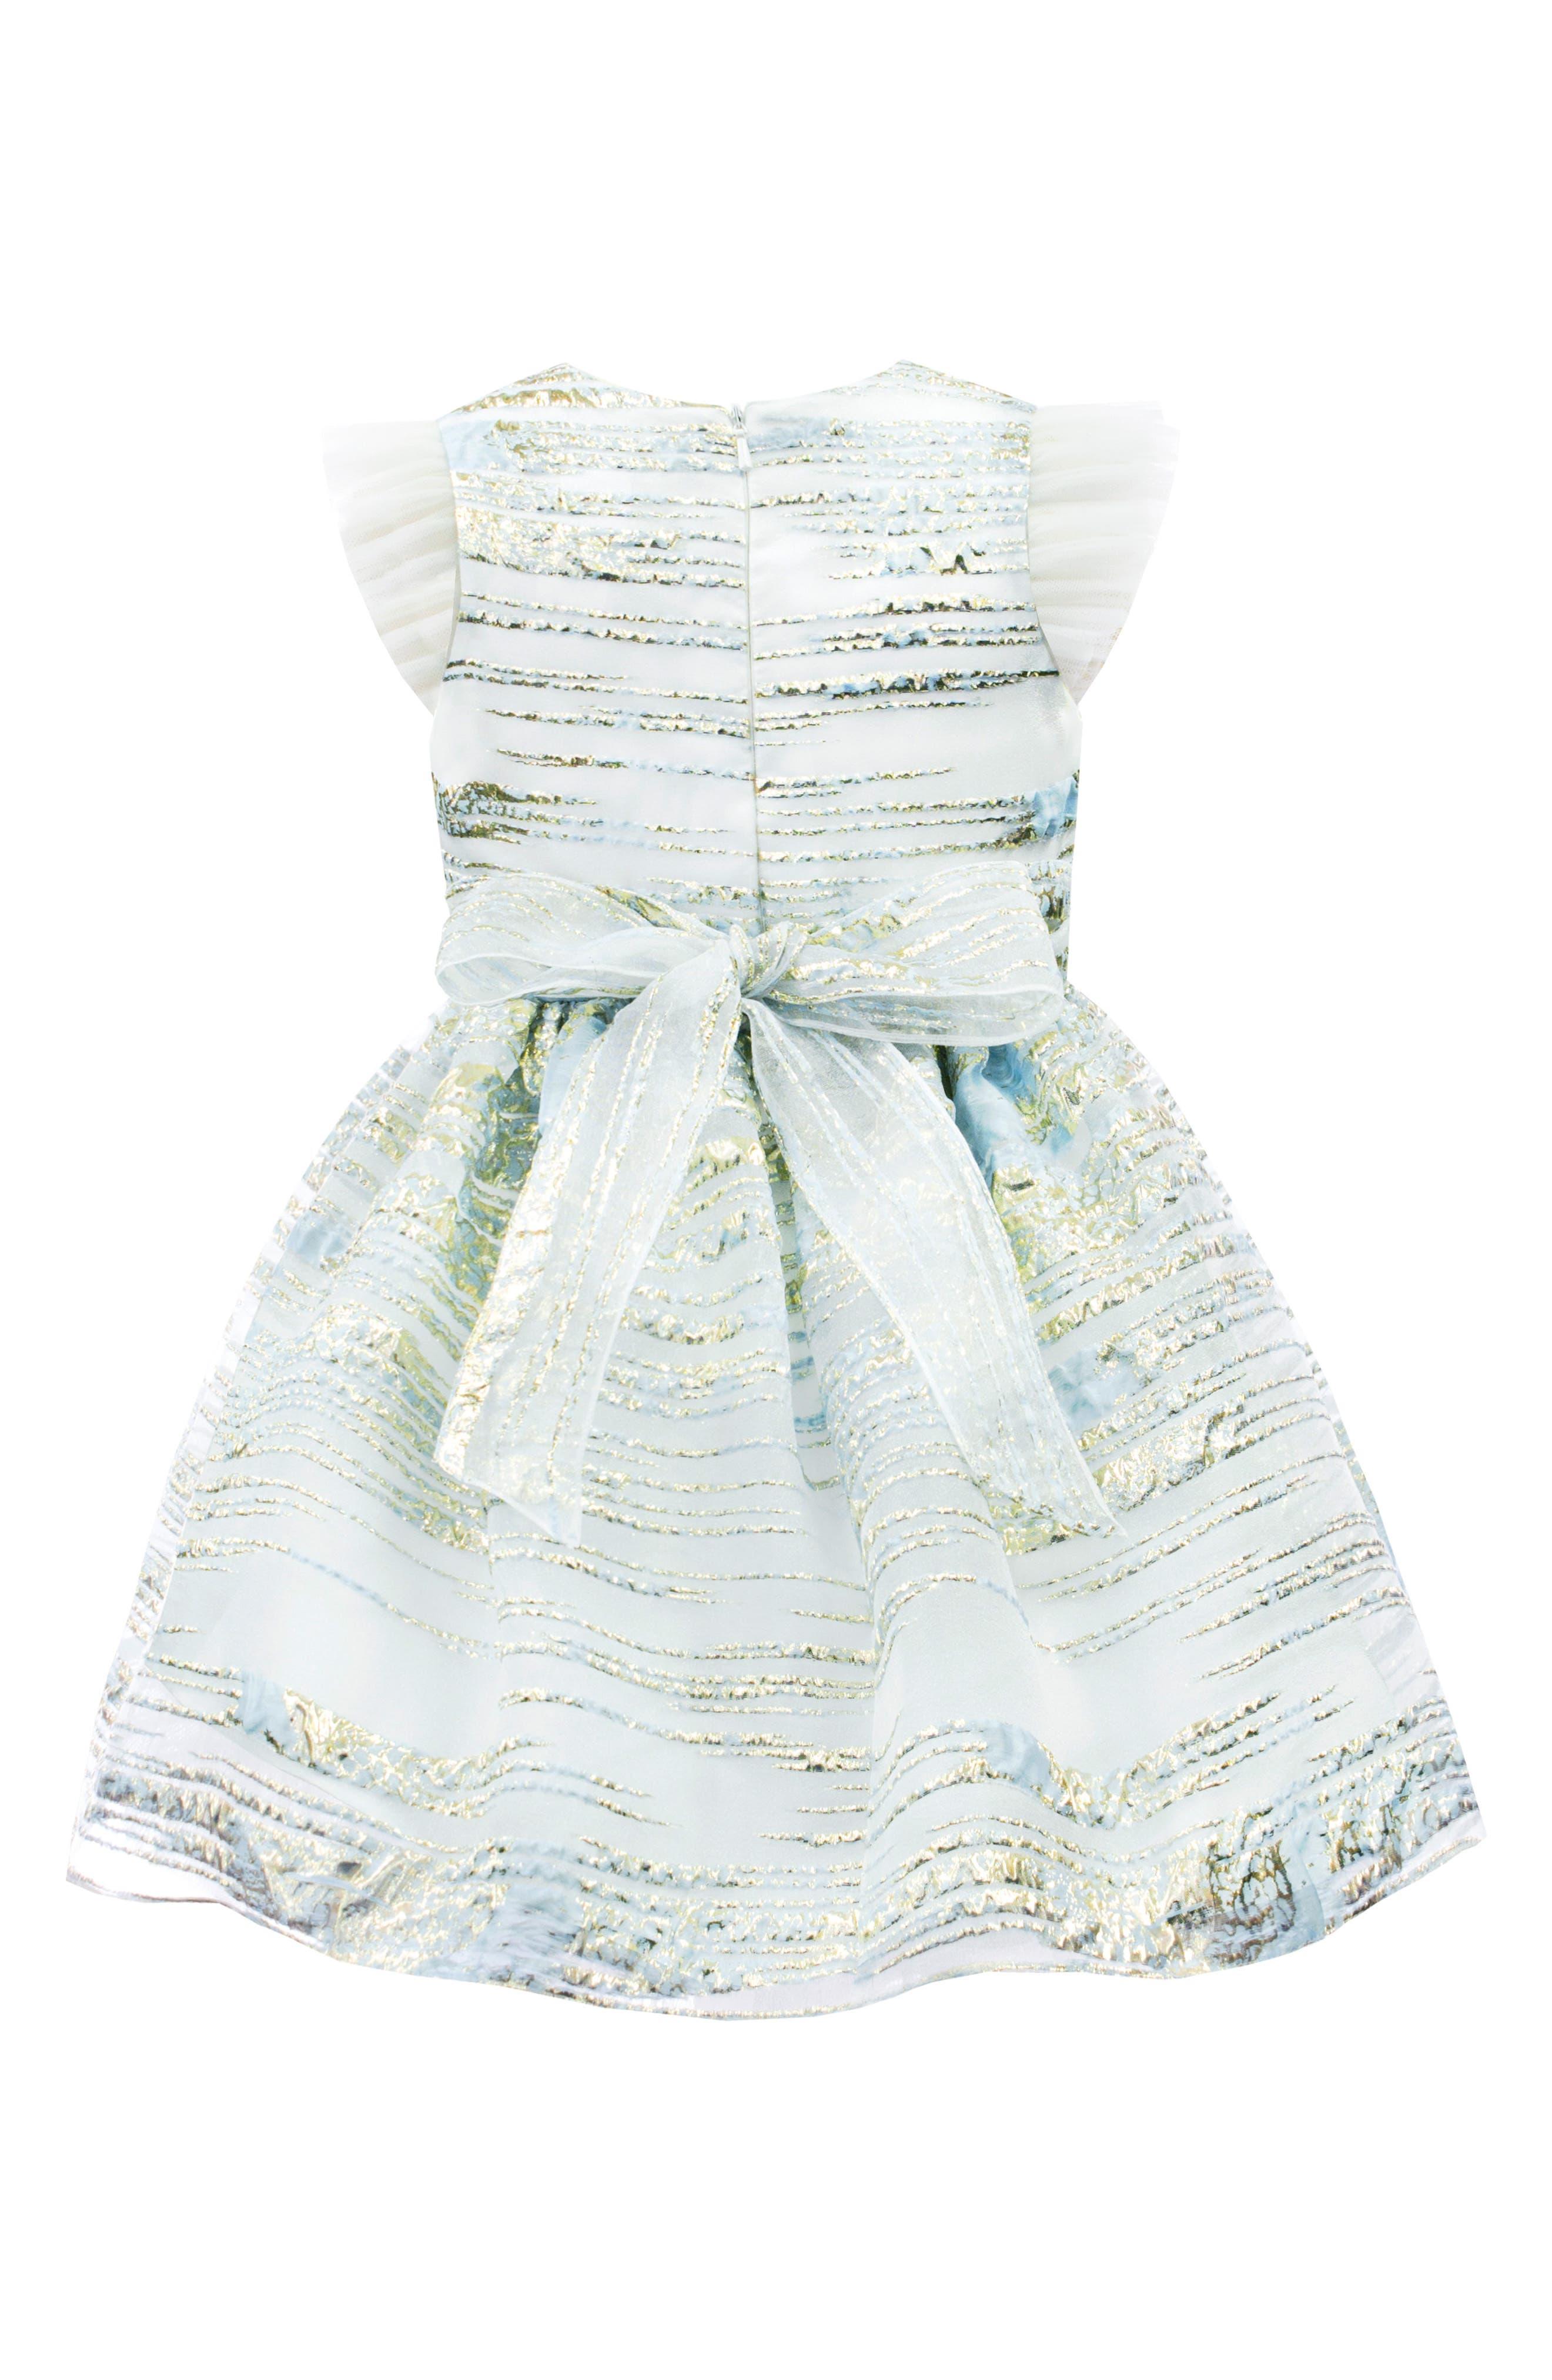 DAVID CHARLES, Metallic Stripe Organza Party Dress, Alternate thumbnail 2, color, BLUE